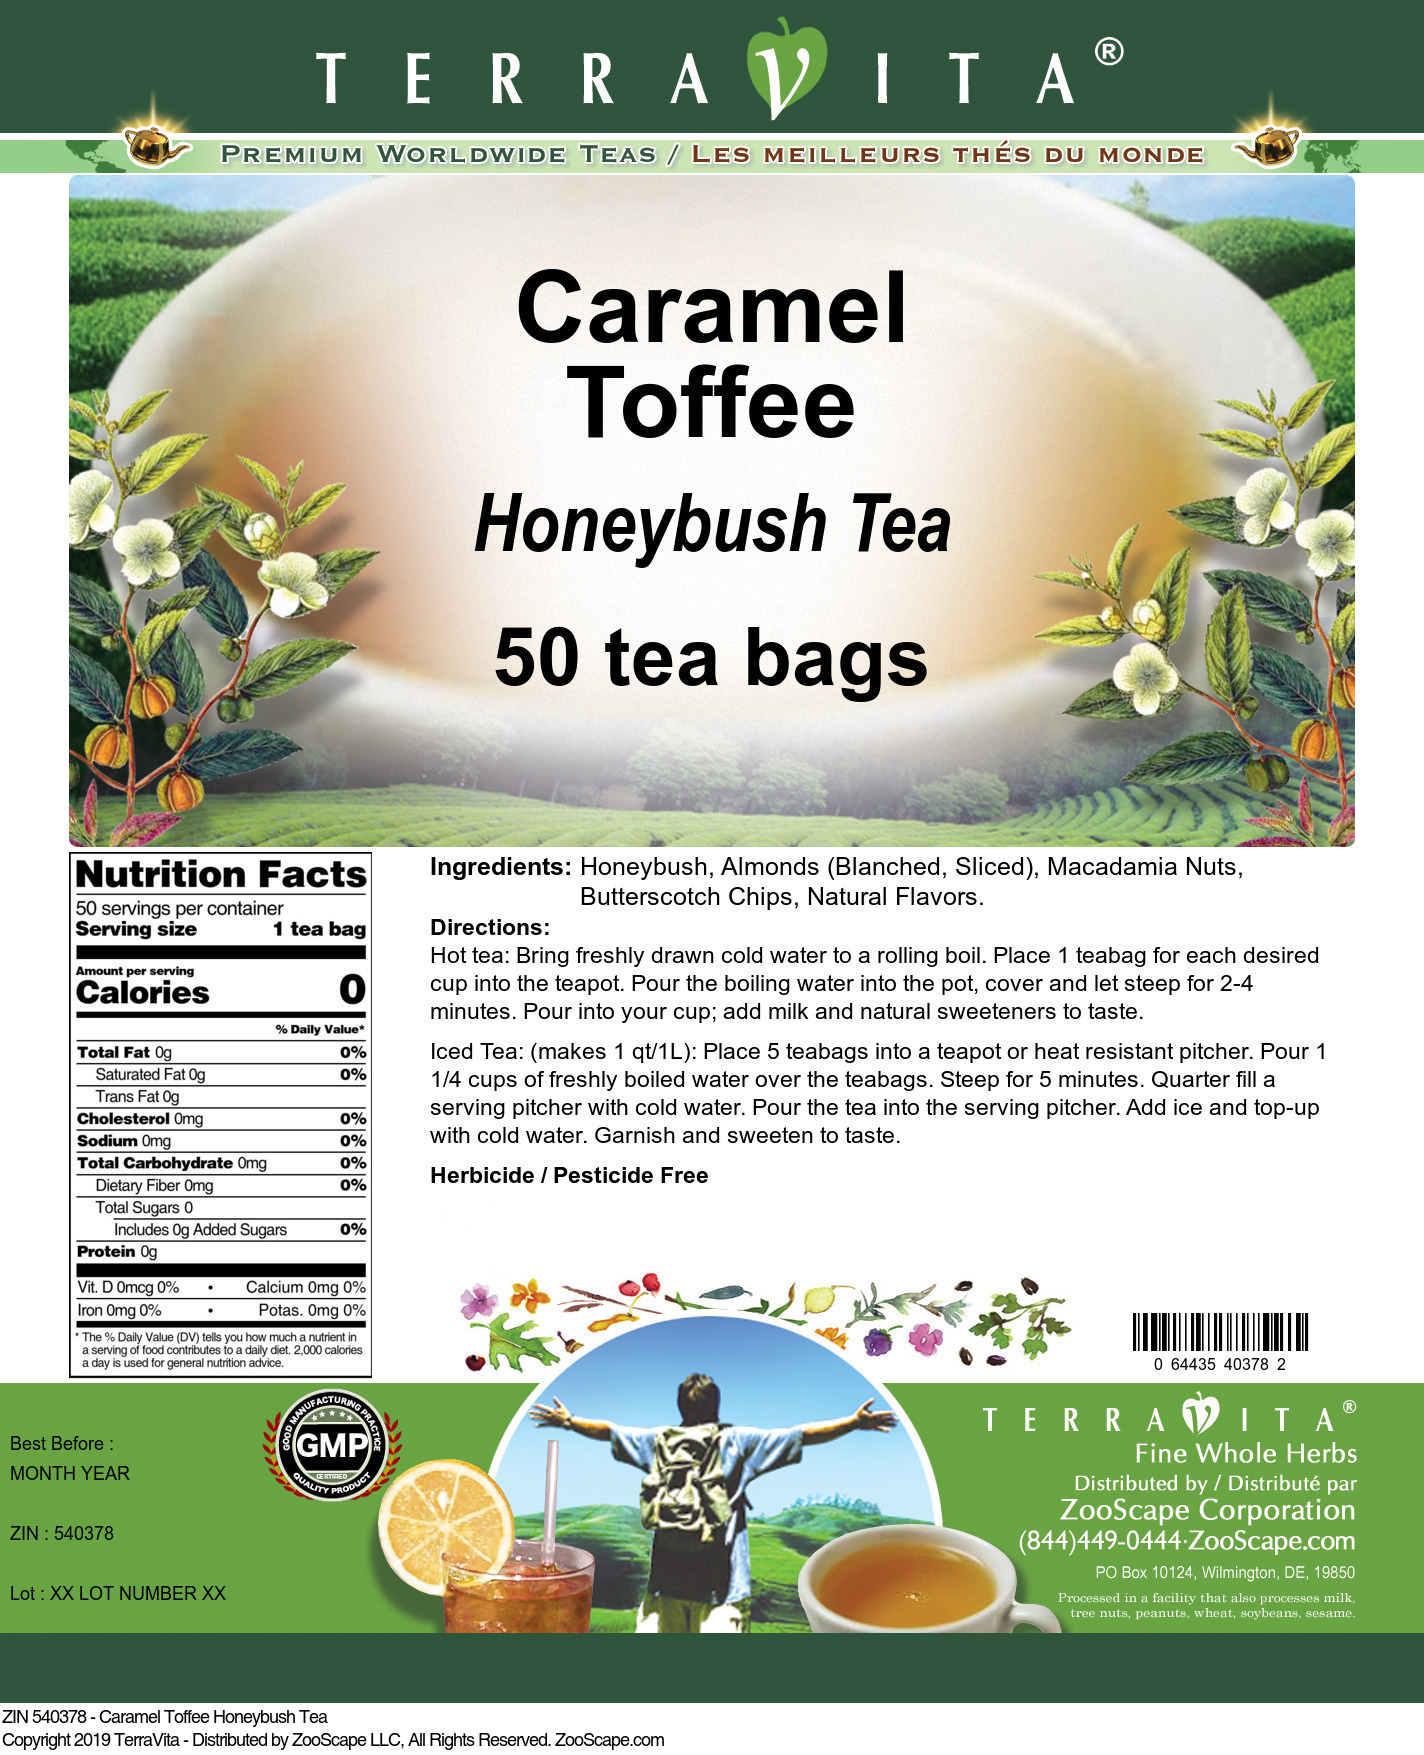 Caramel Toffee Honeybush Tea